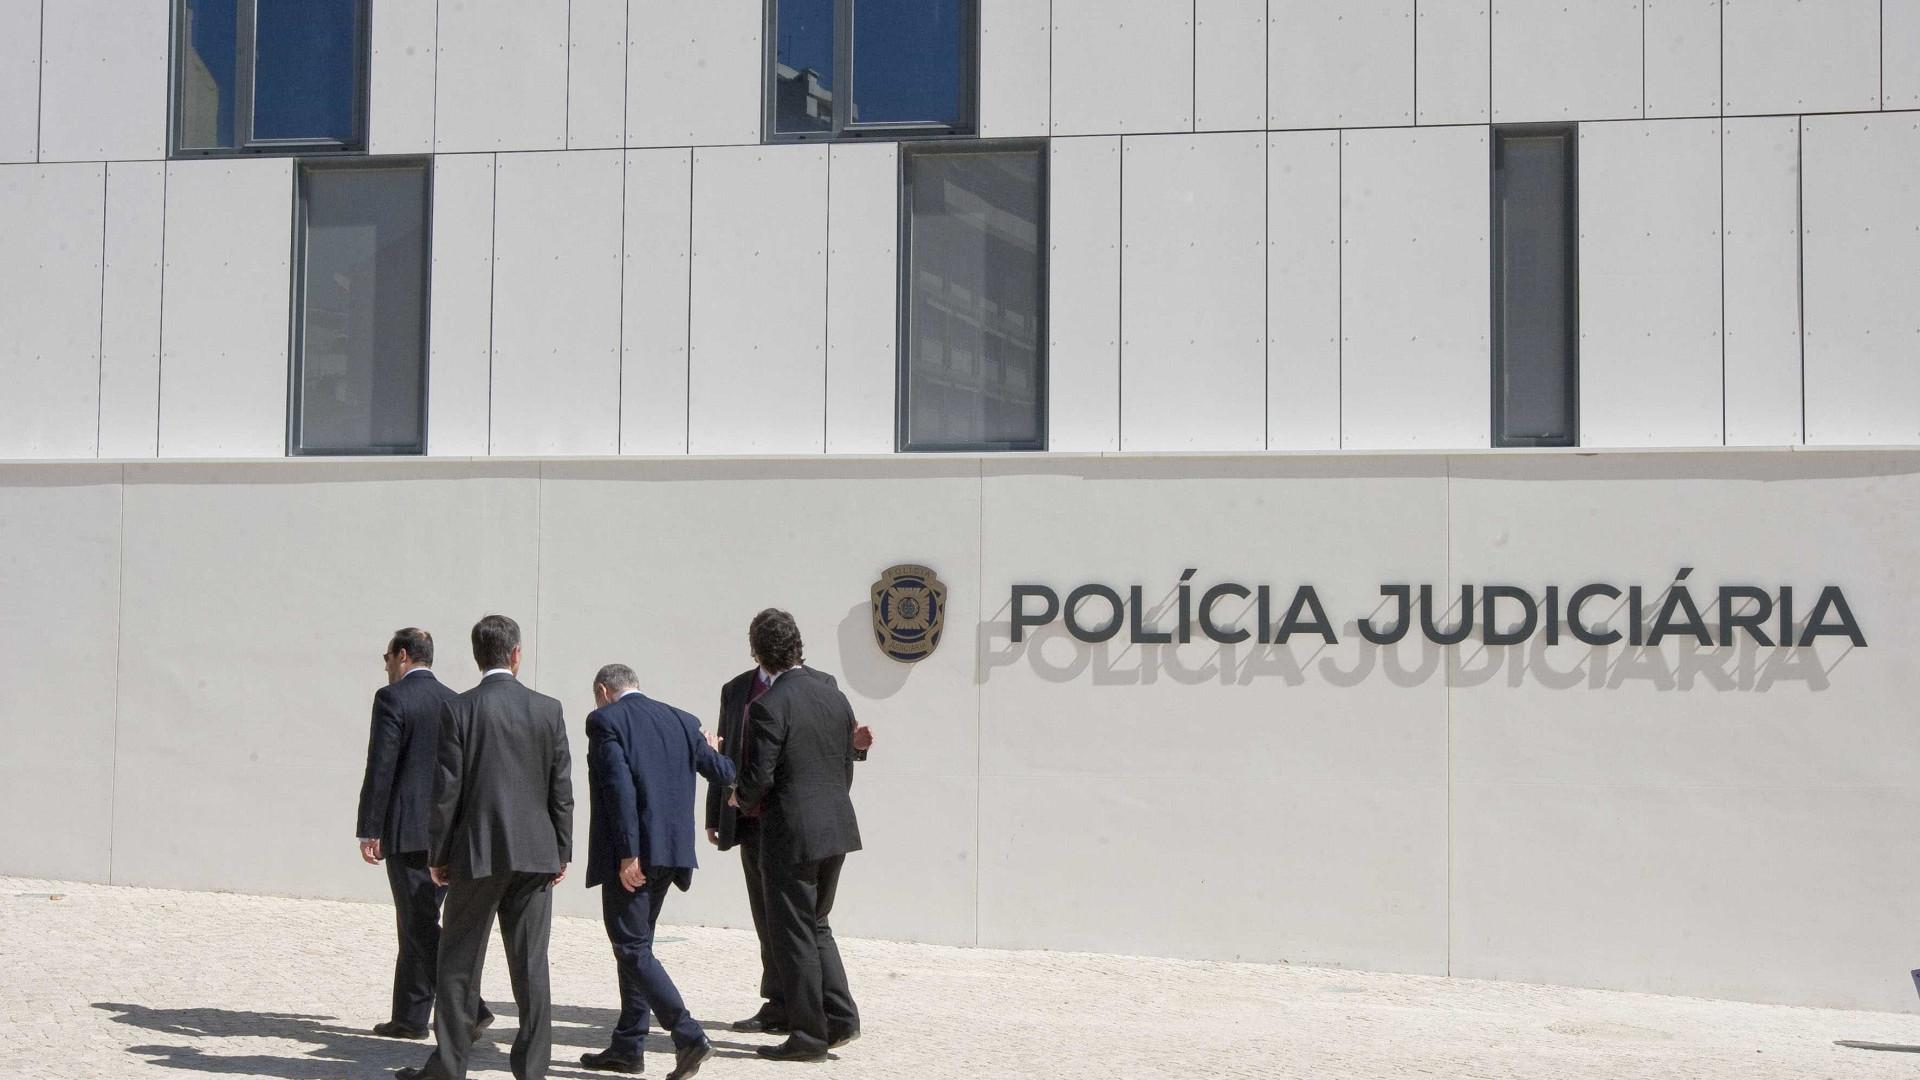 Ministério Público confirma 70 buscas. Partidos e autarquias na mira